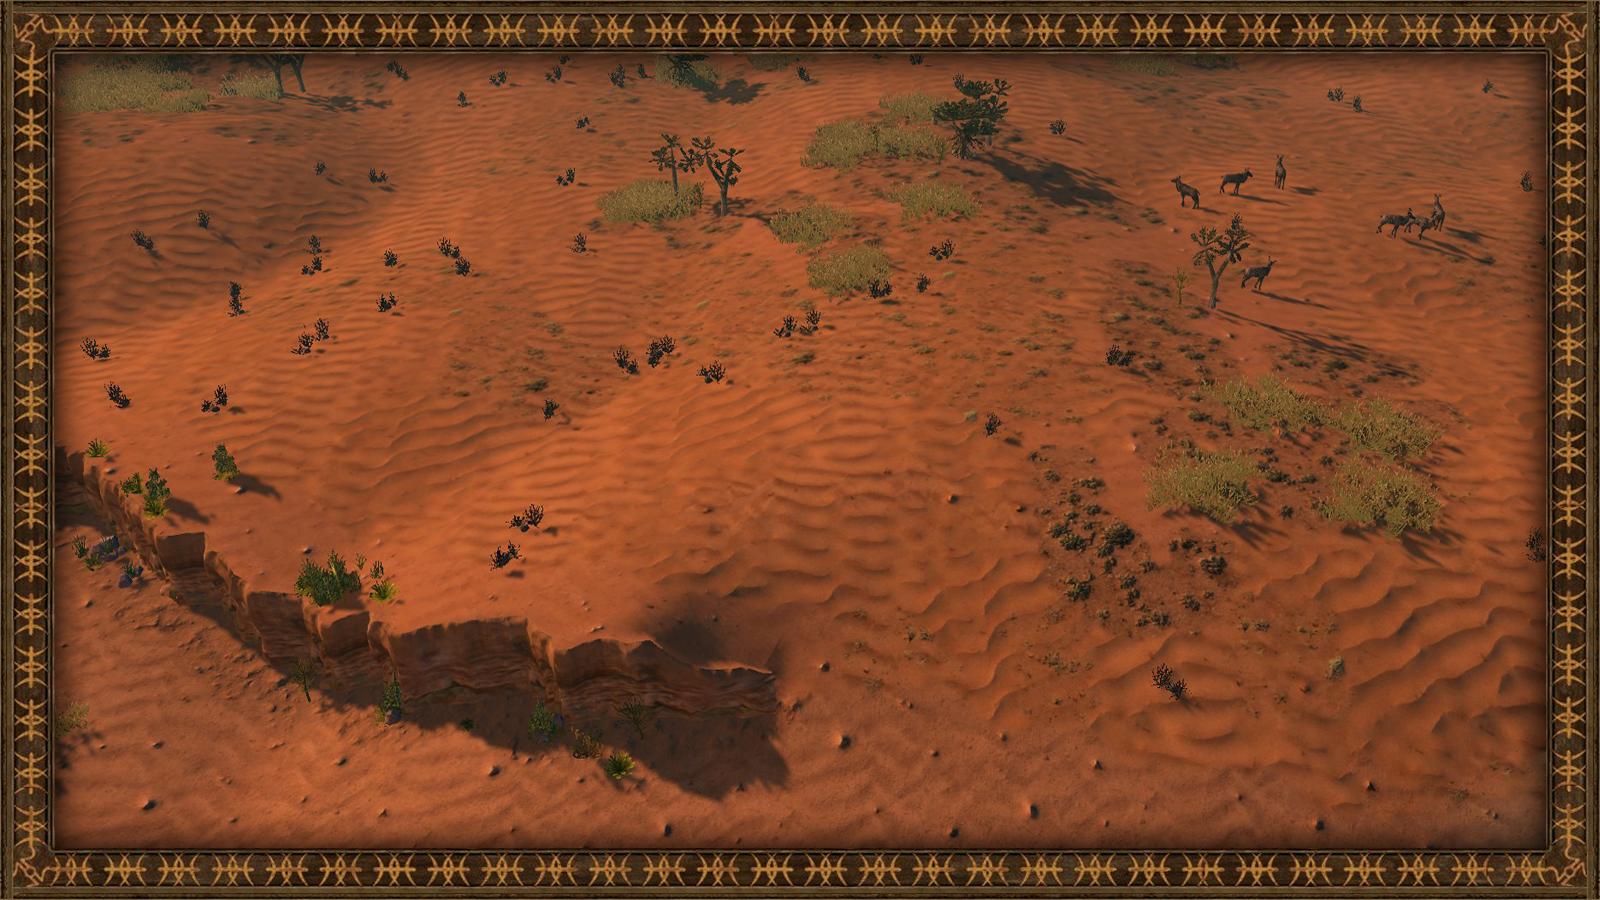 Kalahari wastelands with wildebeest antelopes